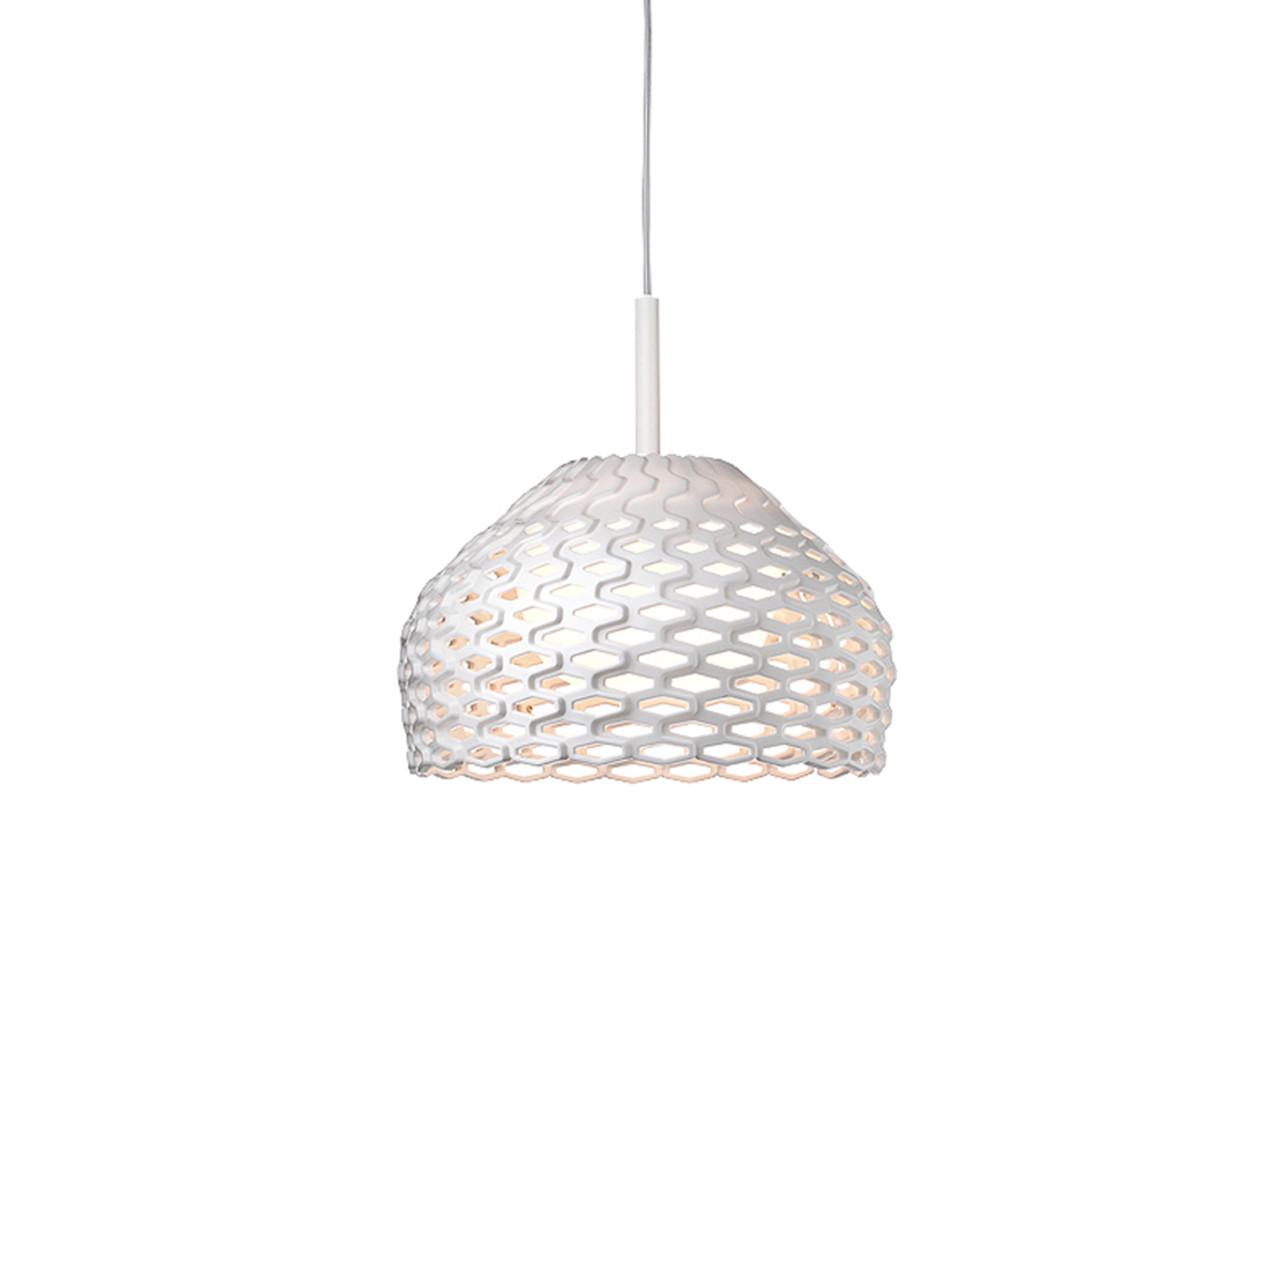 Flos Tatou S Modern Pendant Light By Patricia Urquiola Flos Usa